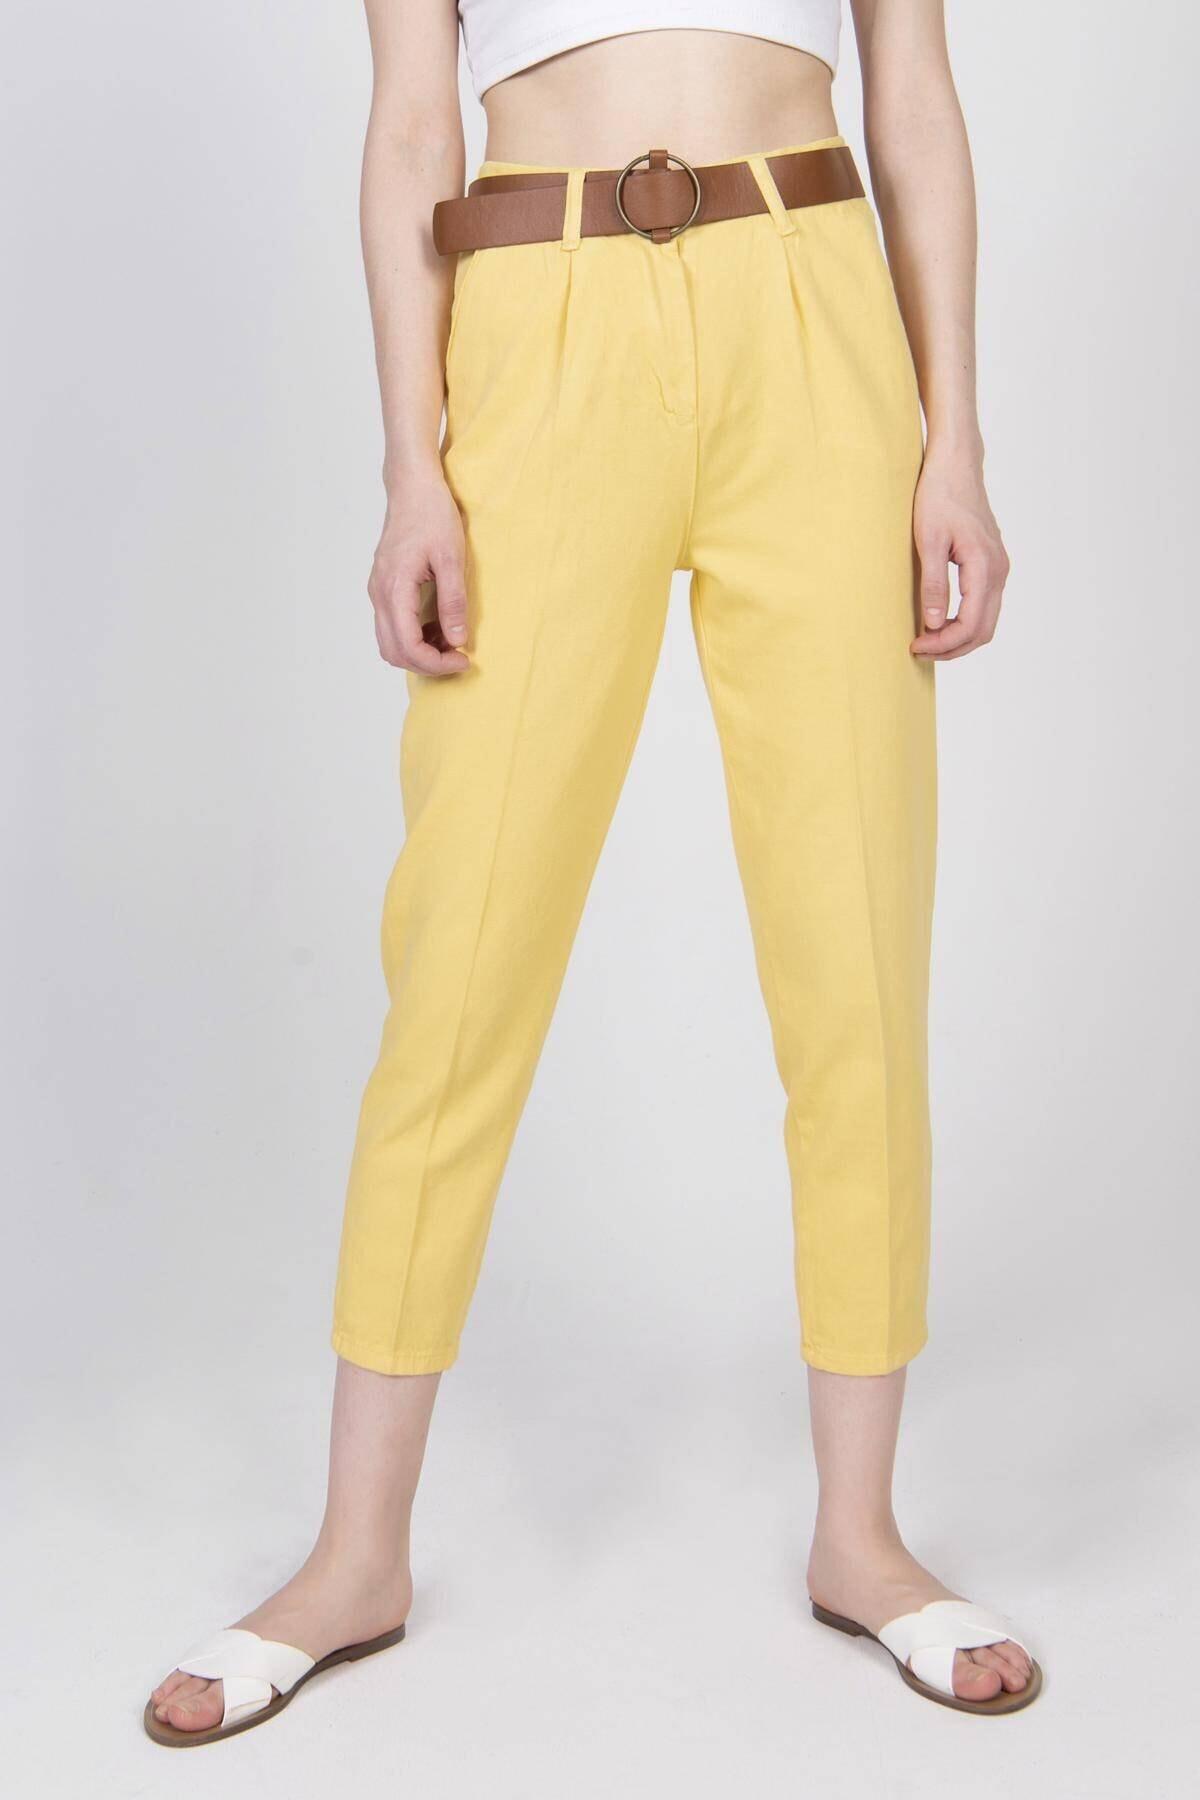 Addax Kadın Sarı Kemerli Pantolon PN4204 - T3 ADX-0000020952 1